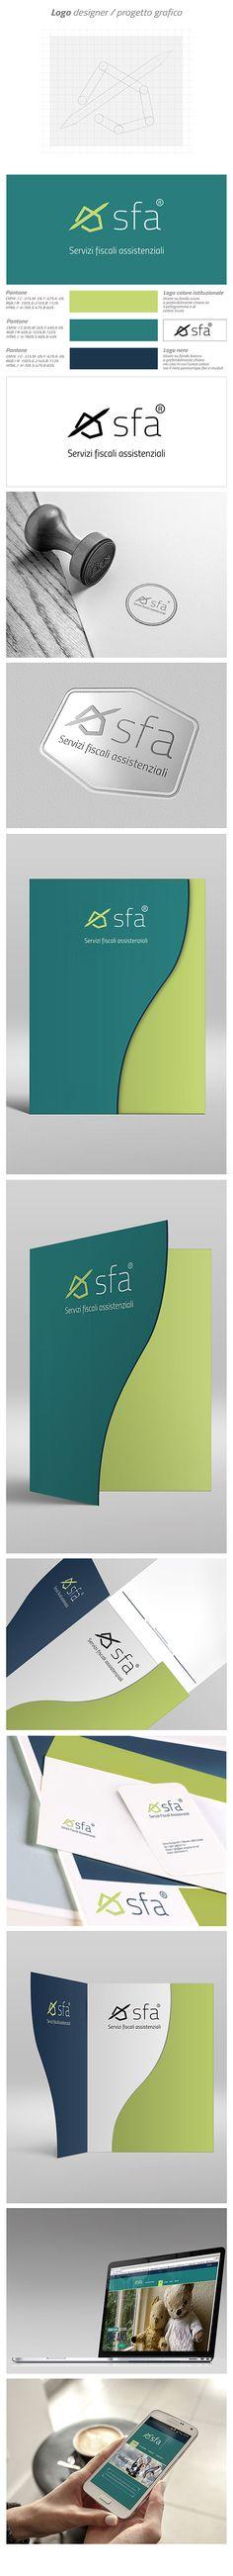 Logodesign - corporate identiti - website